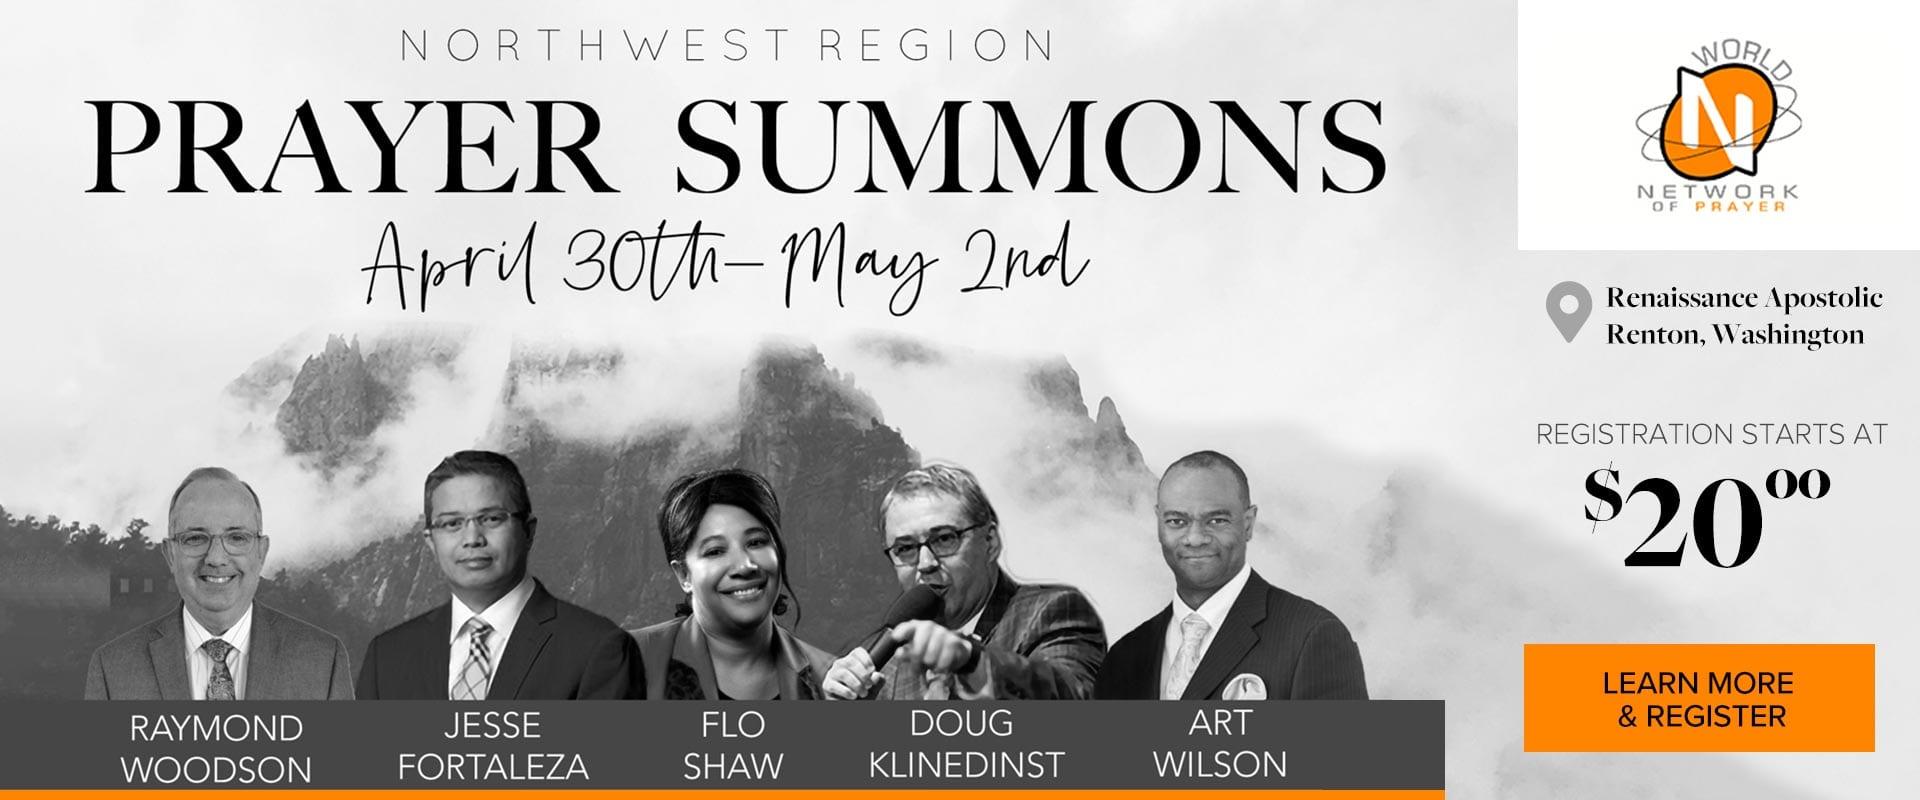 WNOP Prayer Summons